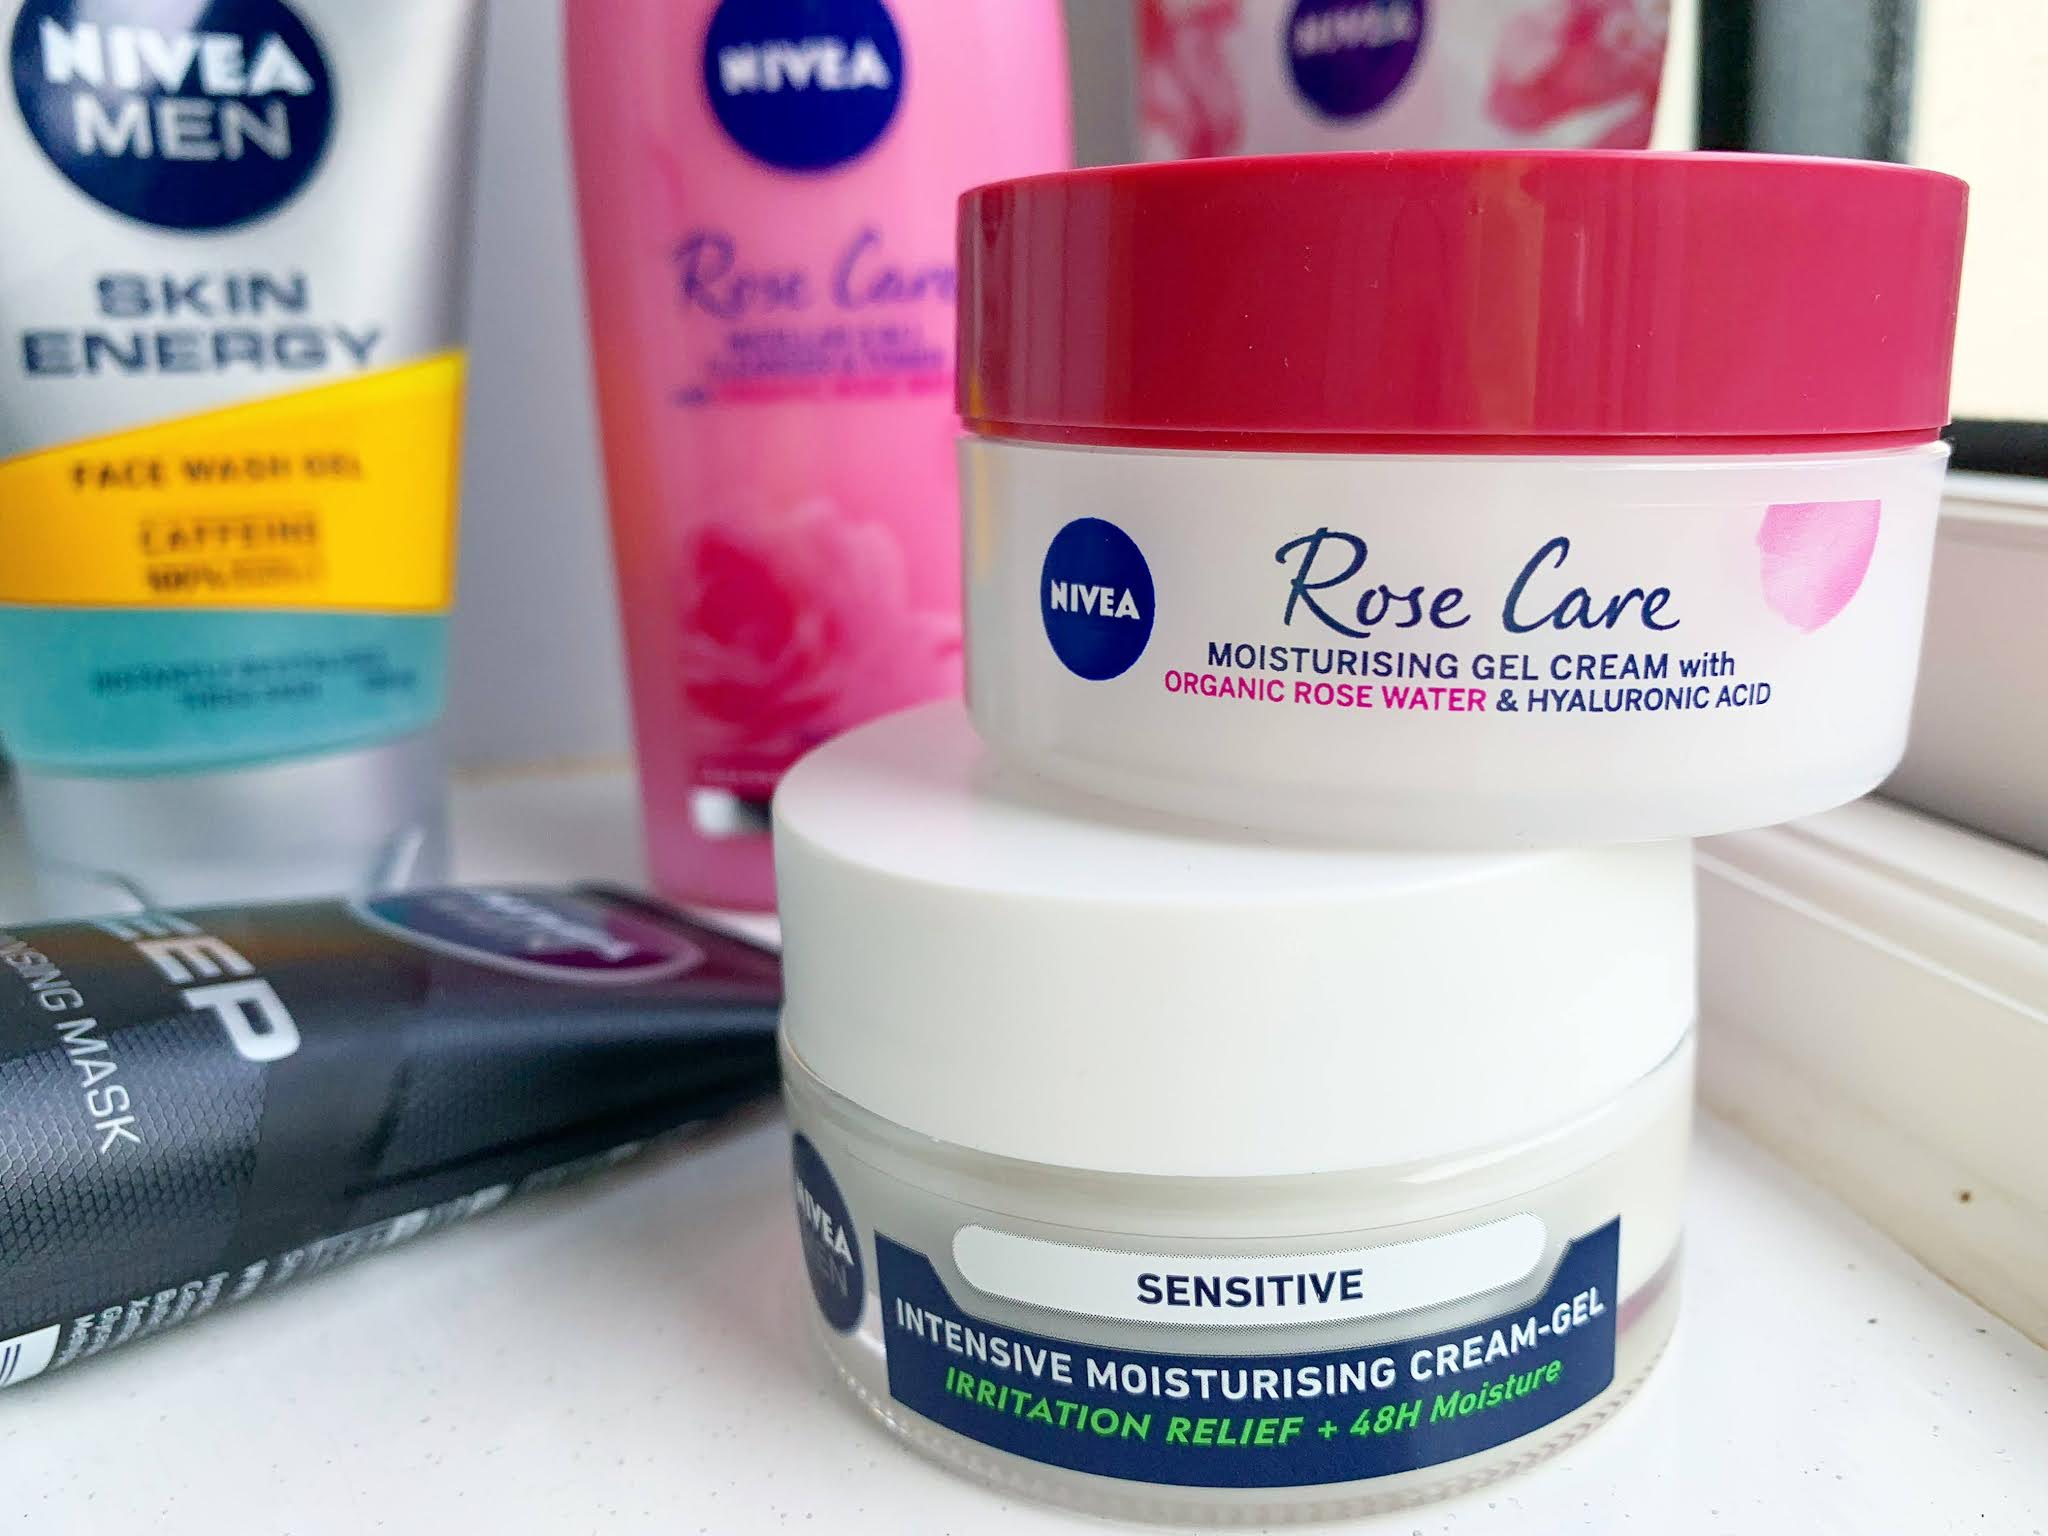 Nivea Rose Care Moisturising Gel Cream